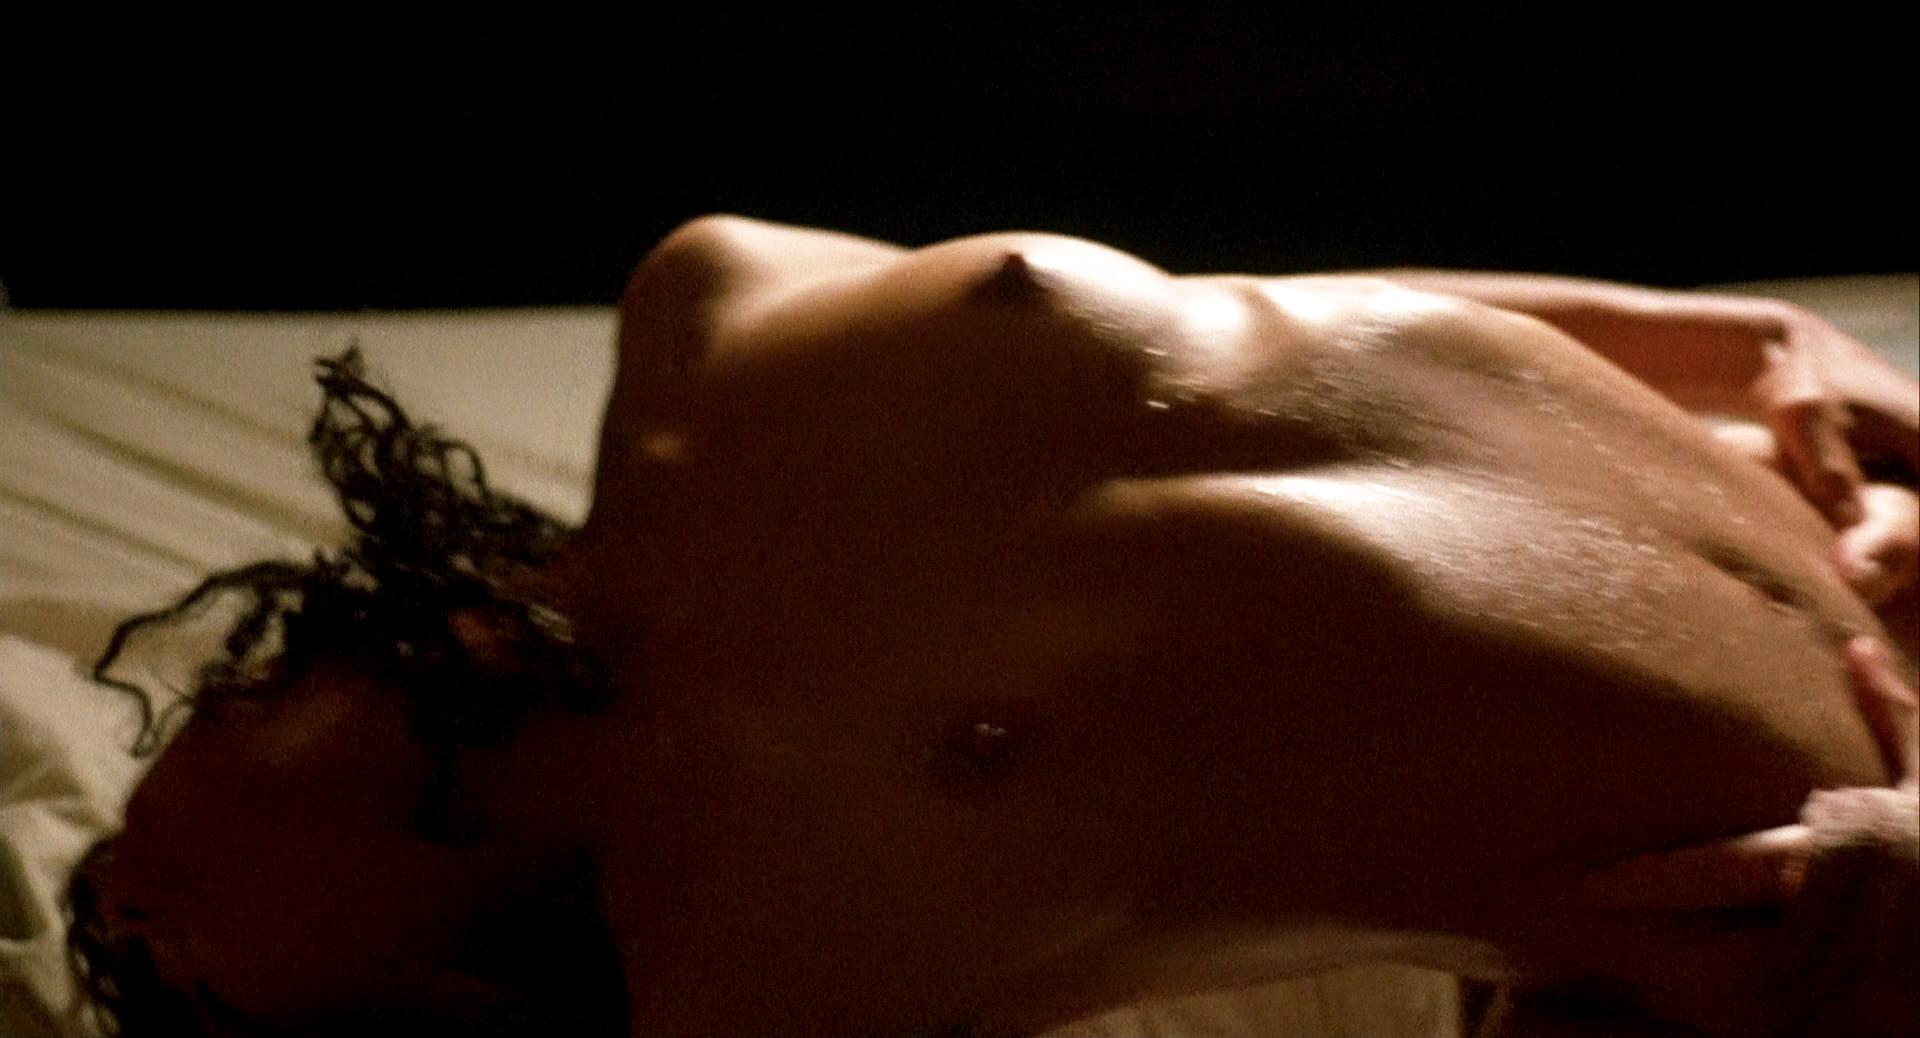 100 Images of Angel Heart Sex Scene